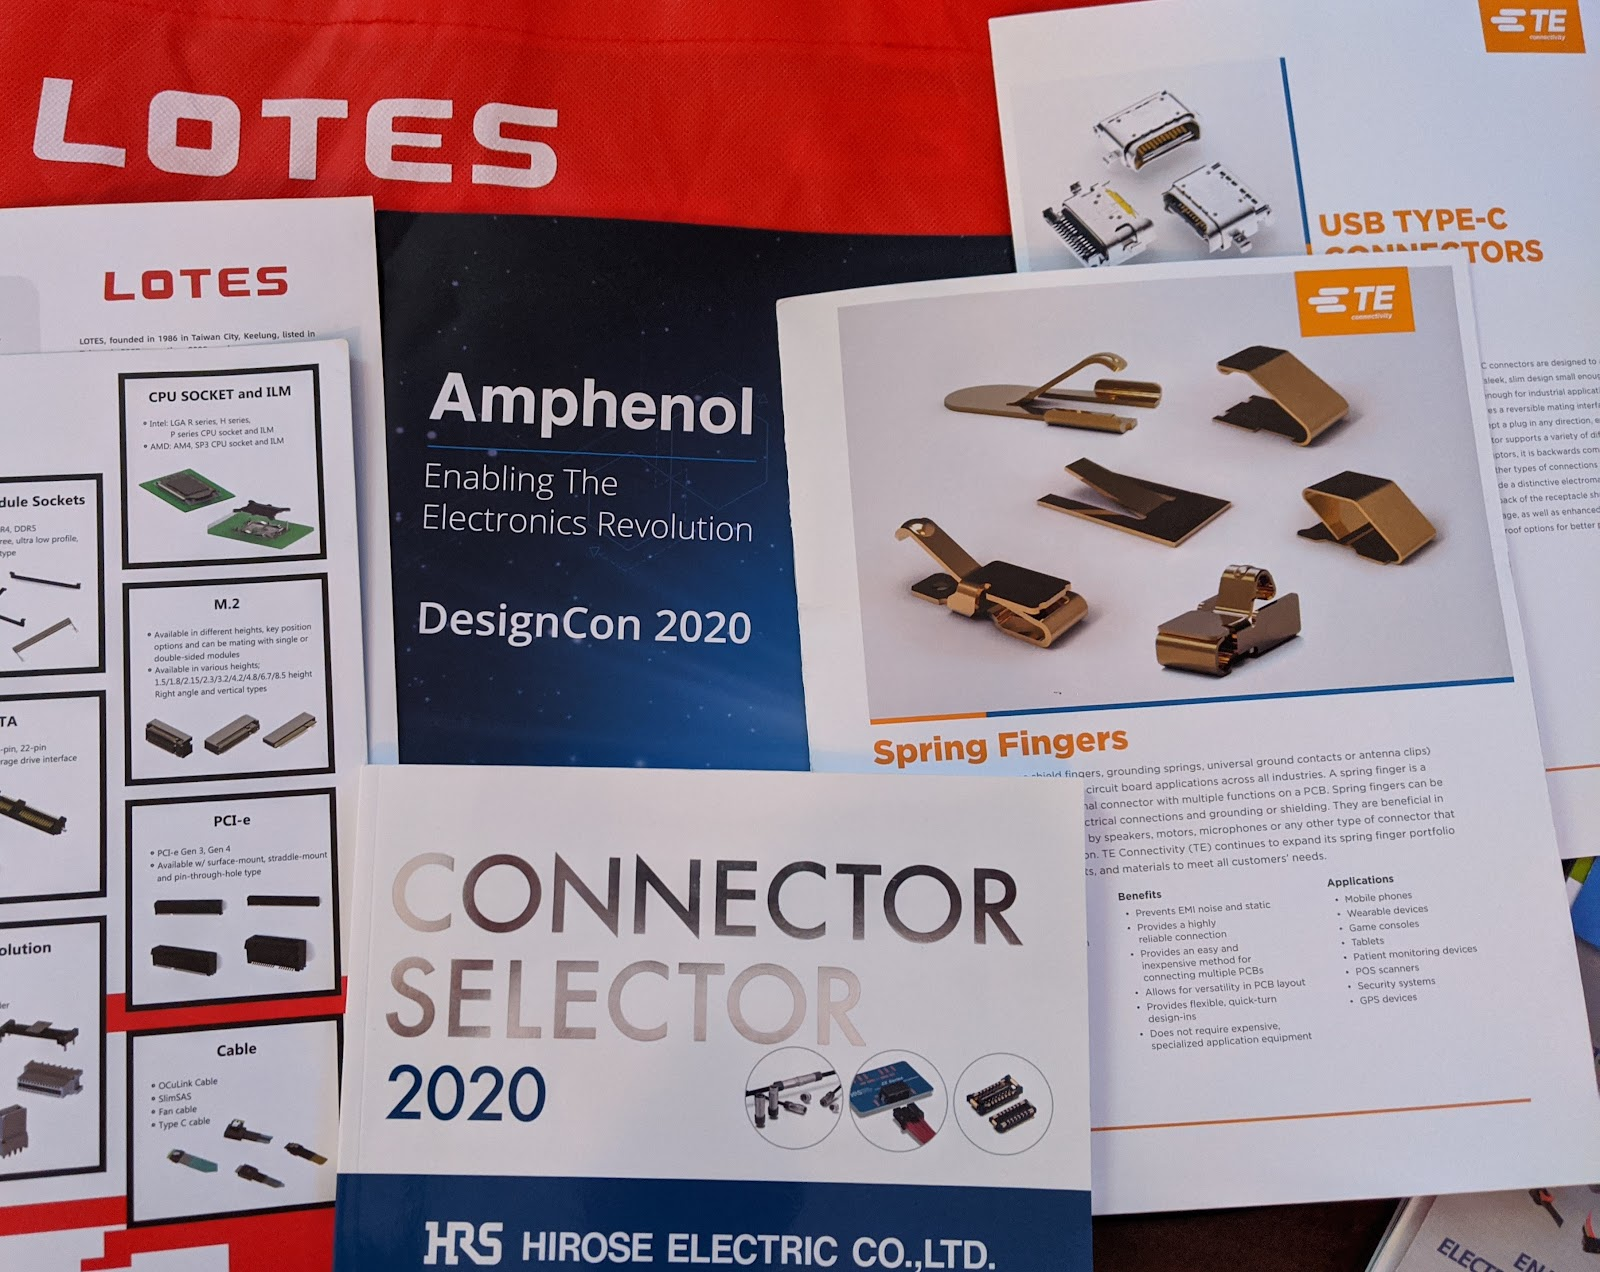 designcon vendors